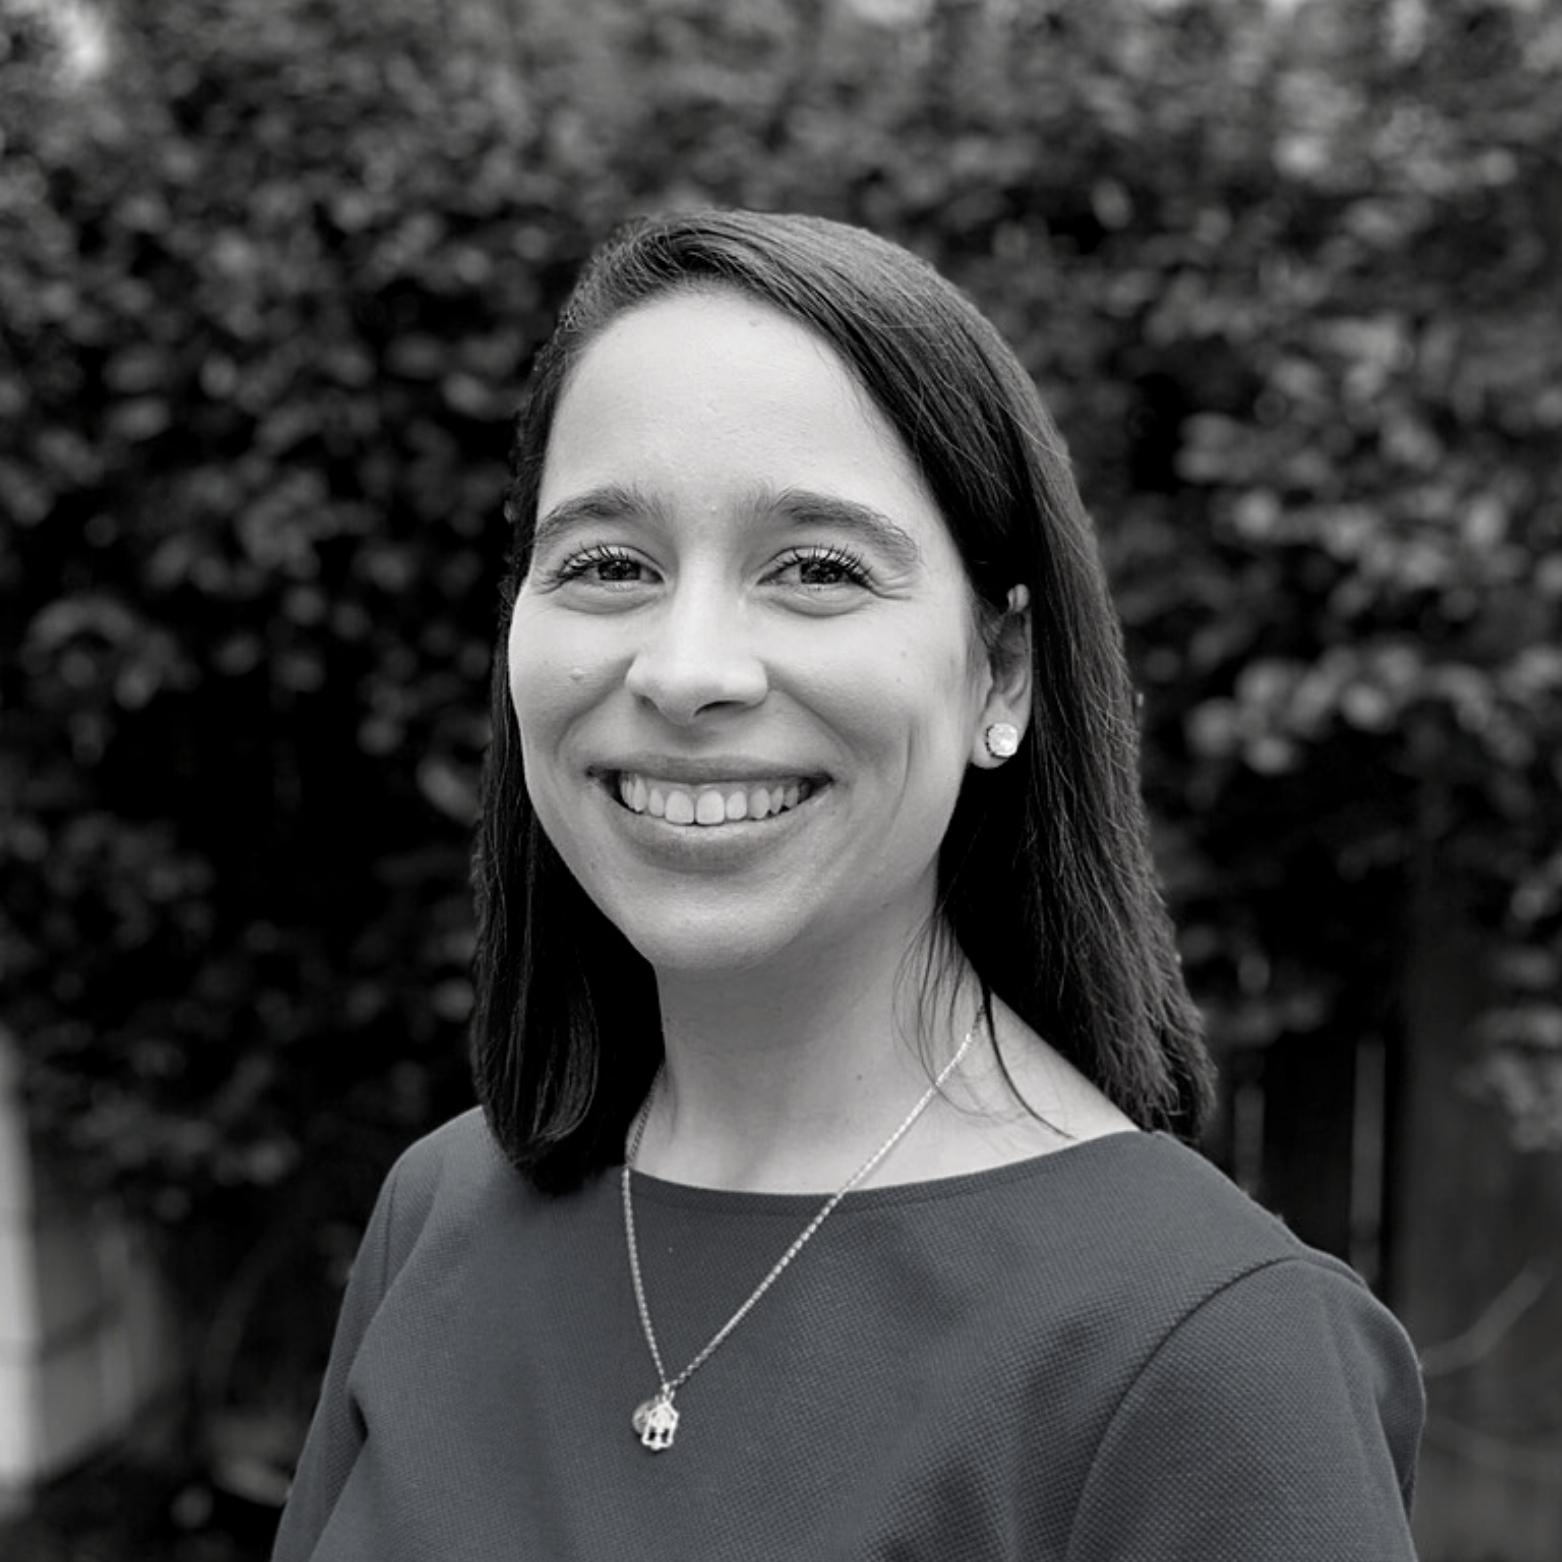 Andreina Aguilar-Hill